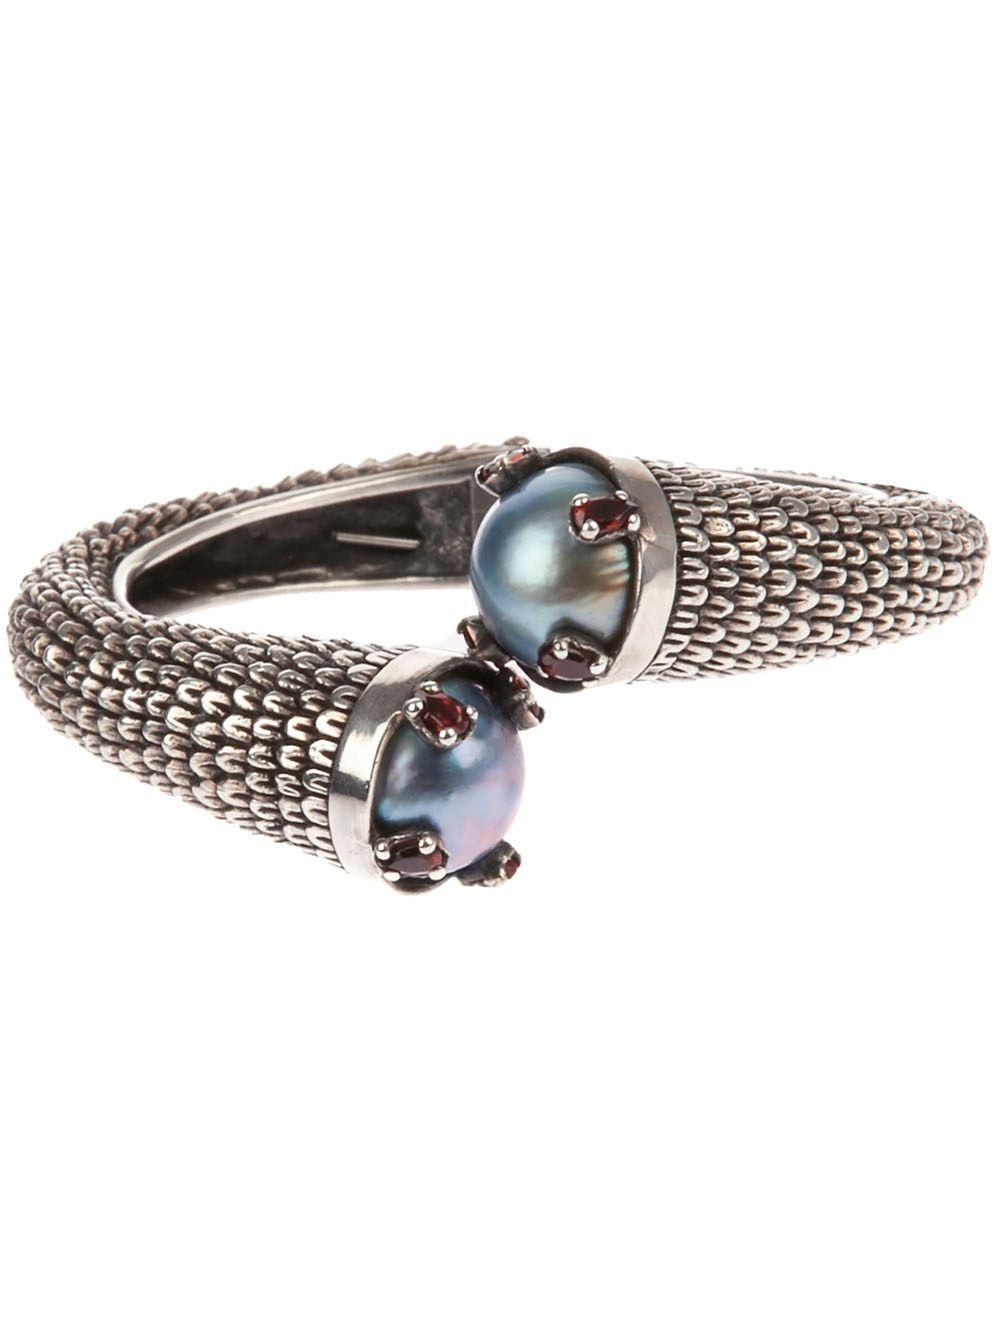 Ugo Cacciatori Ring for Women, Oxidised Silver, Silver, 2017, Medium